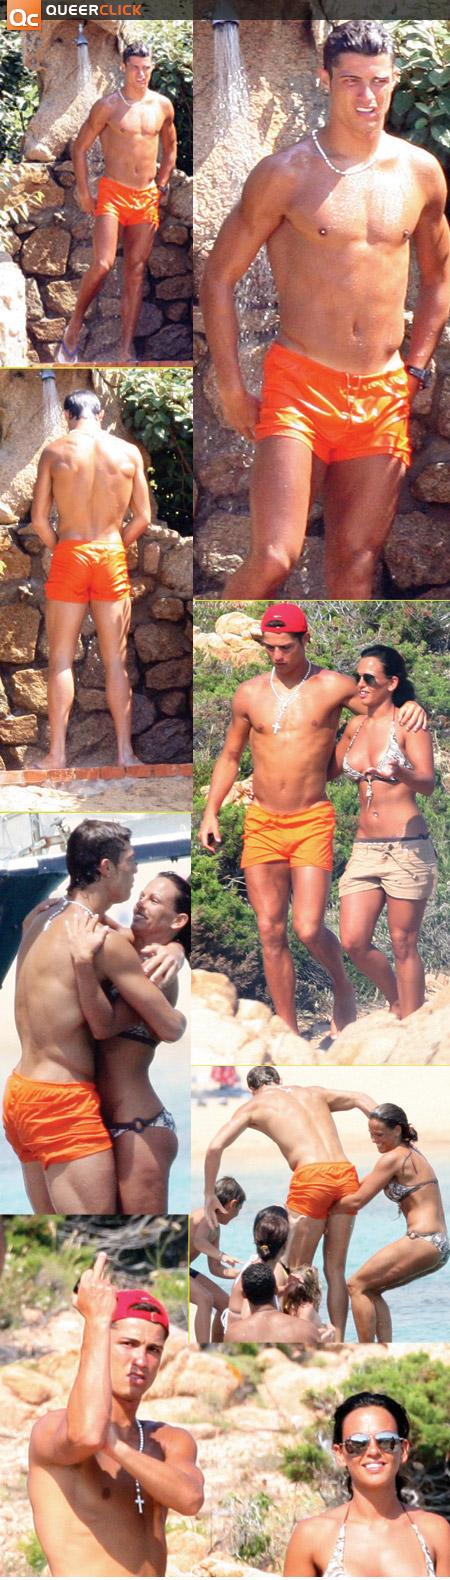 Cristiano Ronaldo loves QC!